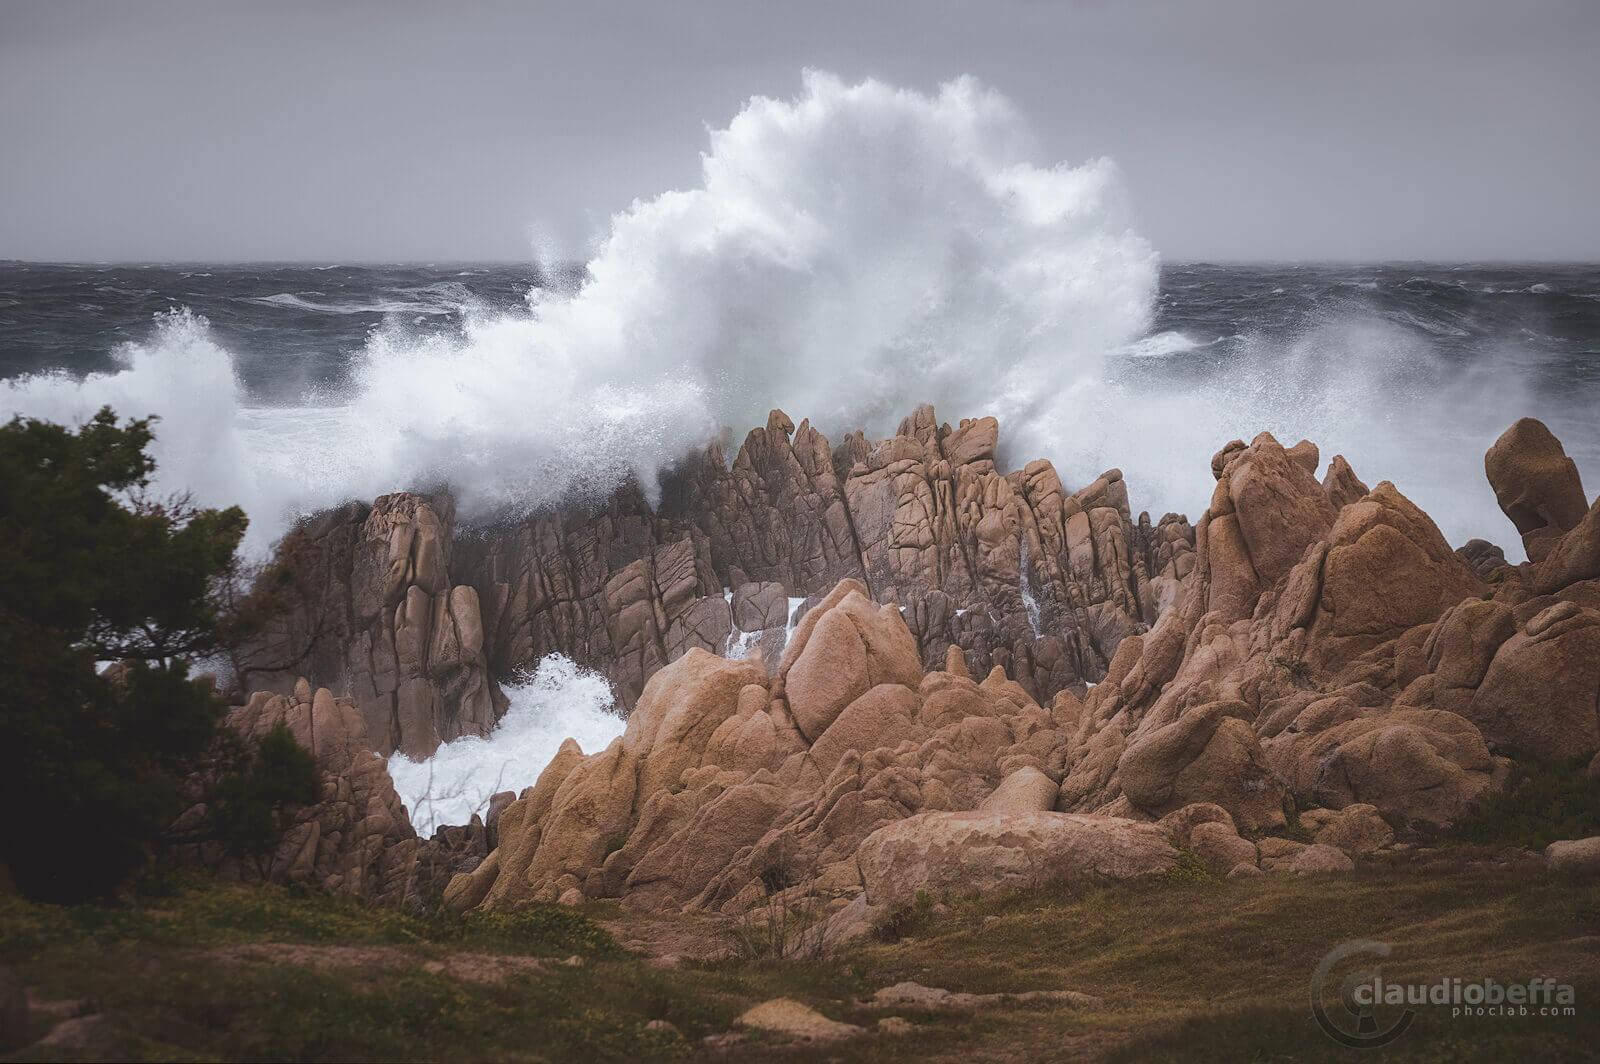 Sardinia, Sardegna, Italy, Sea, Storm, Waves, Rocks, Nature, Landscape, Seascape, Impact